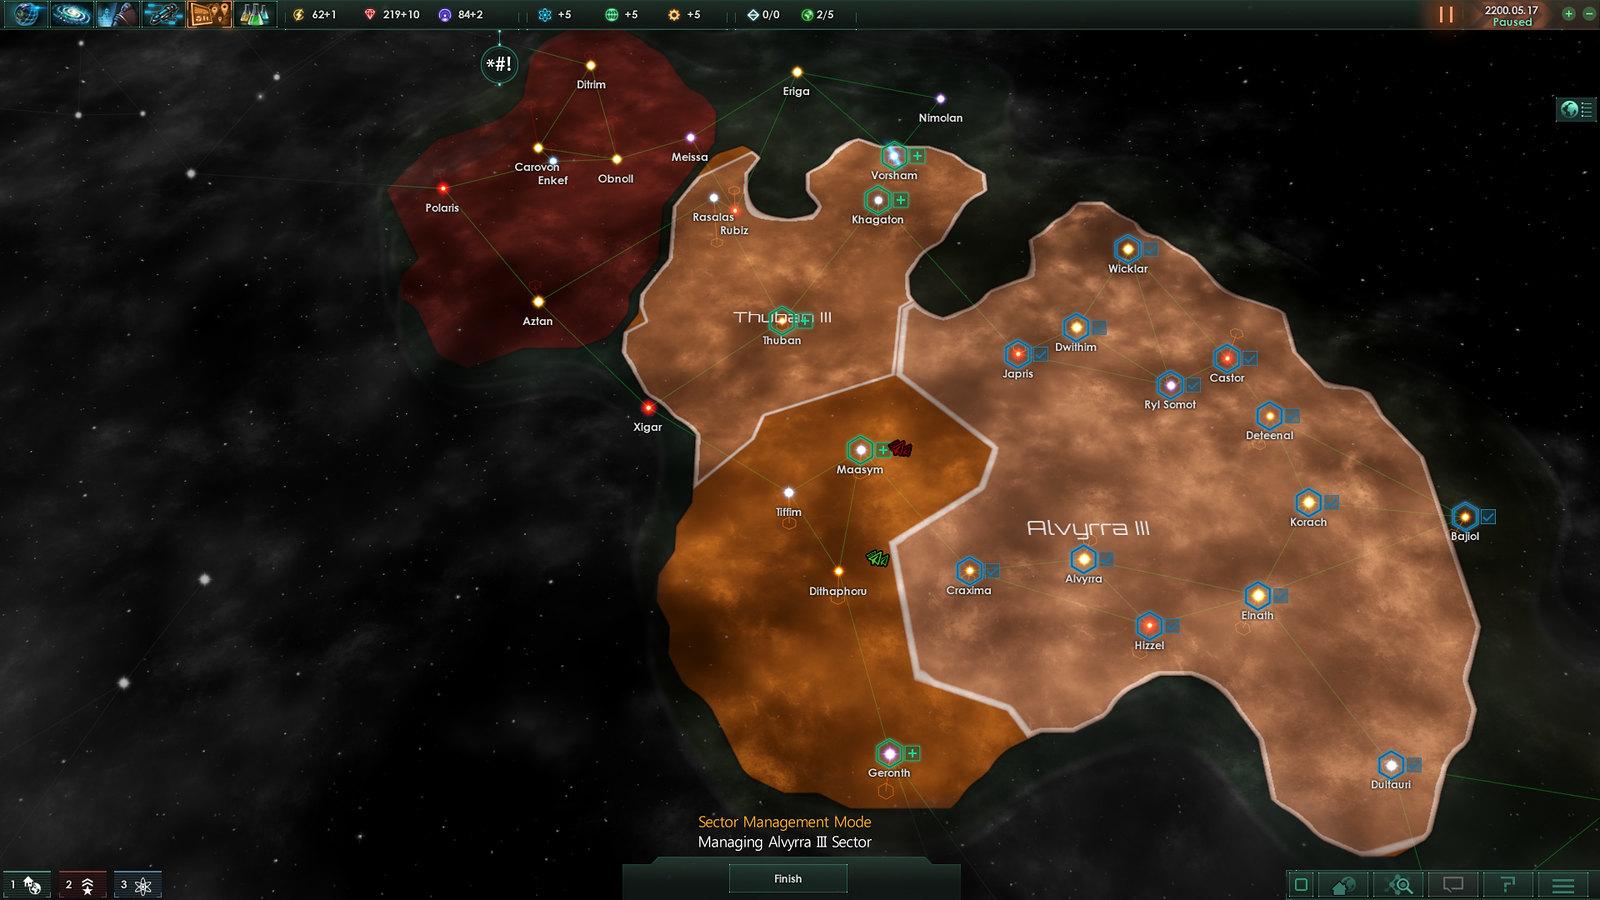 sectores administrativos imperios